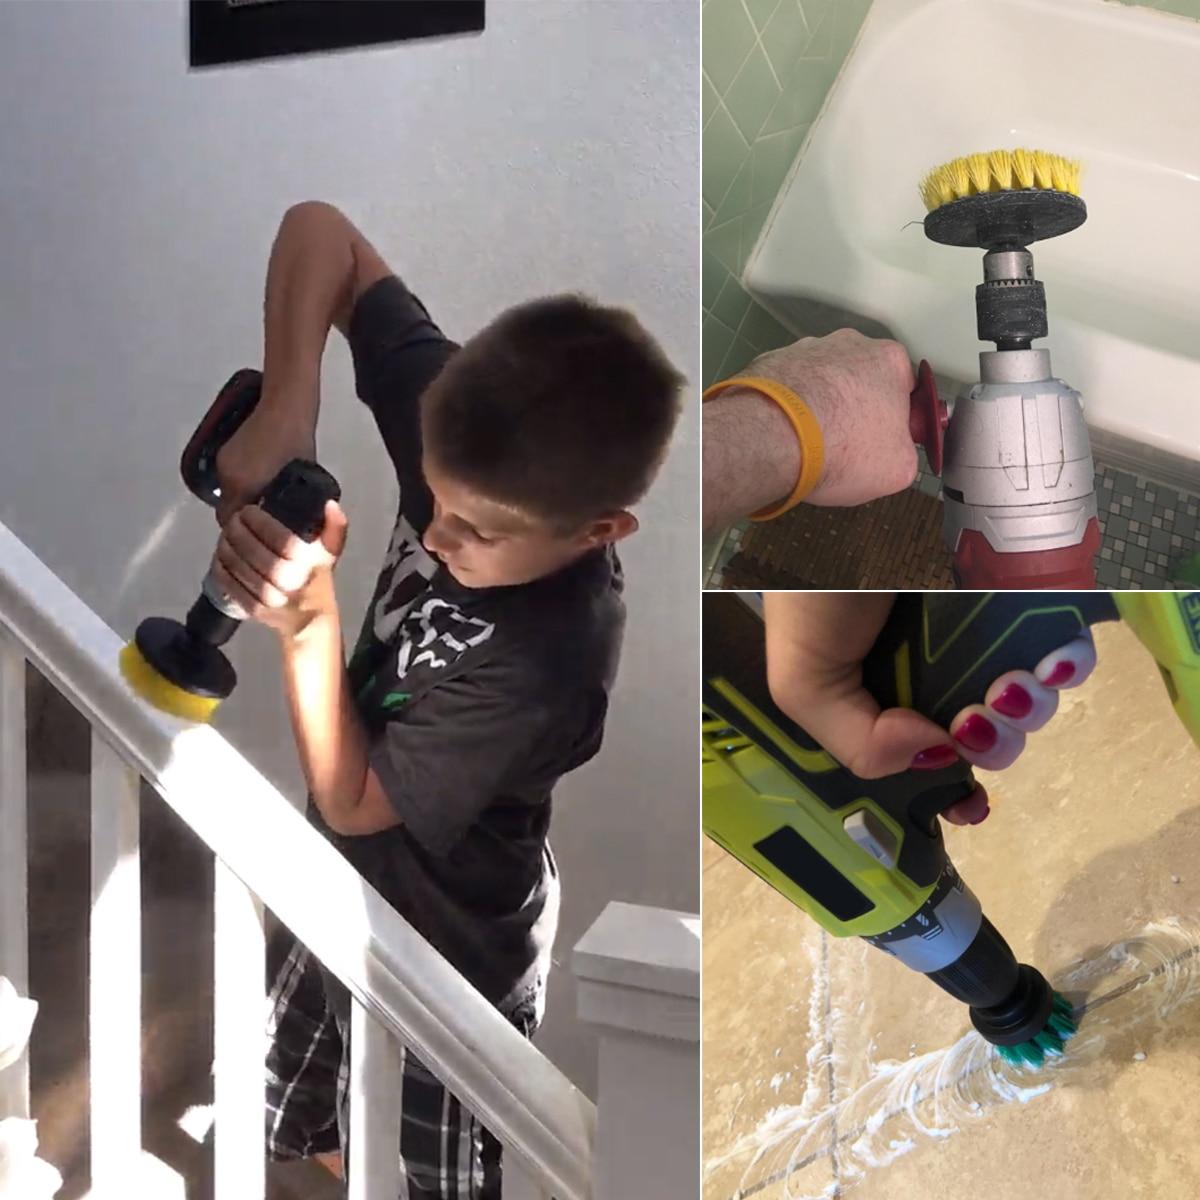 Купить с кэшбэком 2 Sets 3 pcs/set Power Scrubber Brush Drill Brush Clean for Bathroom Surfaces Tub Shower Tile Grout Cordless Scrub Cleaning Kit